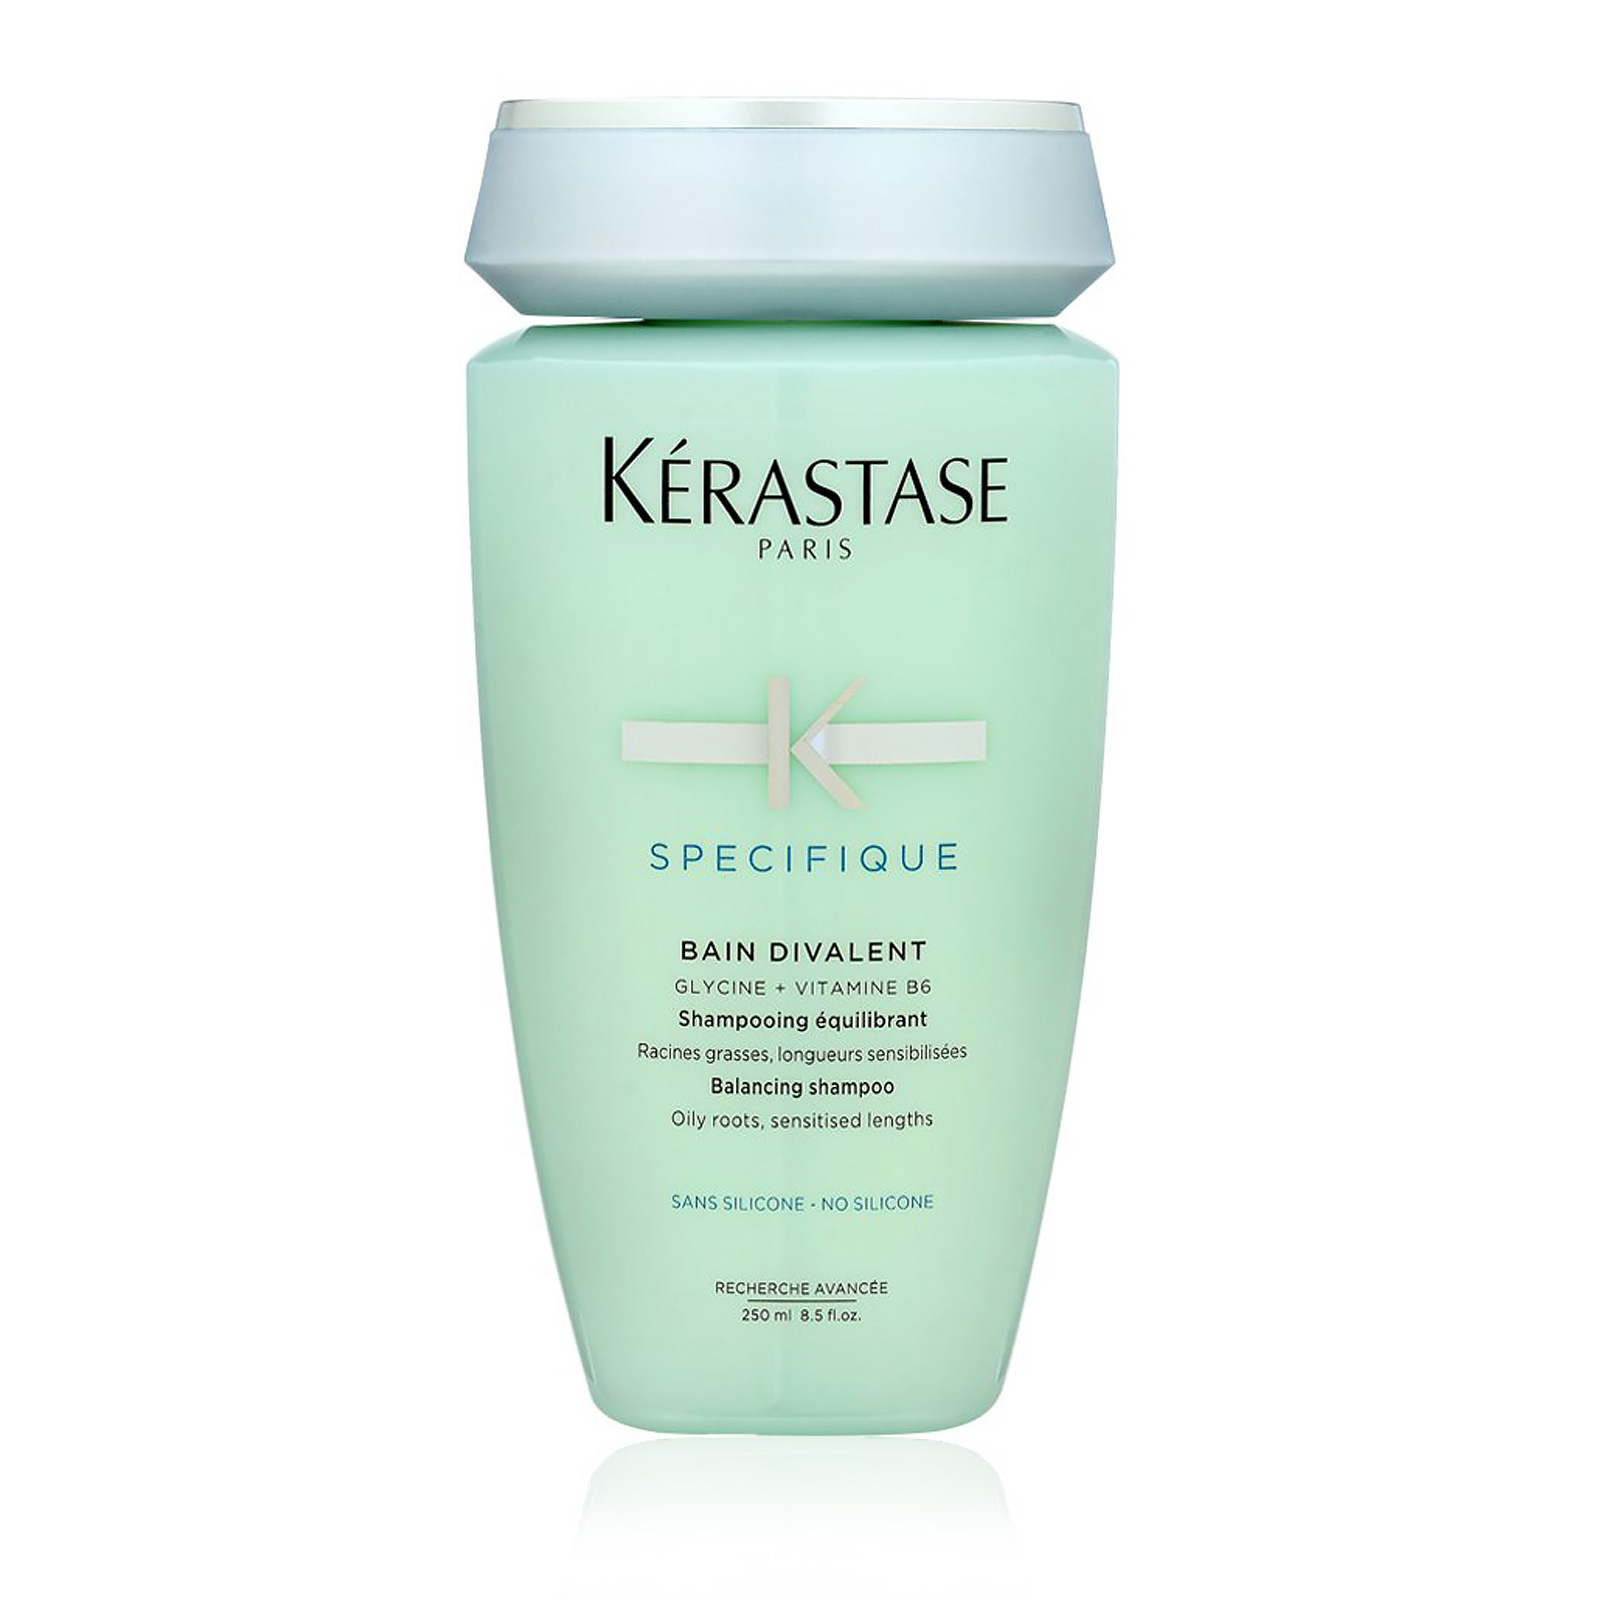 Specifique Bain Divalent Balancing Shampoo